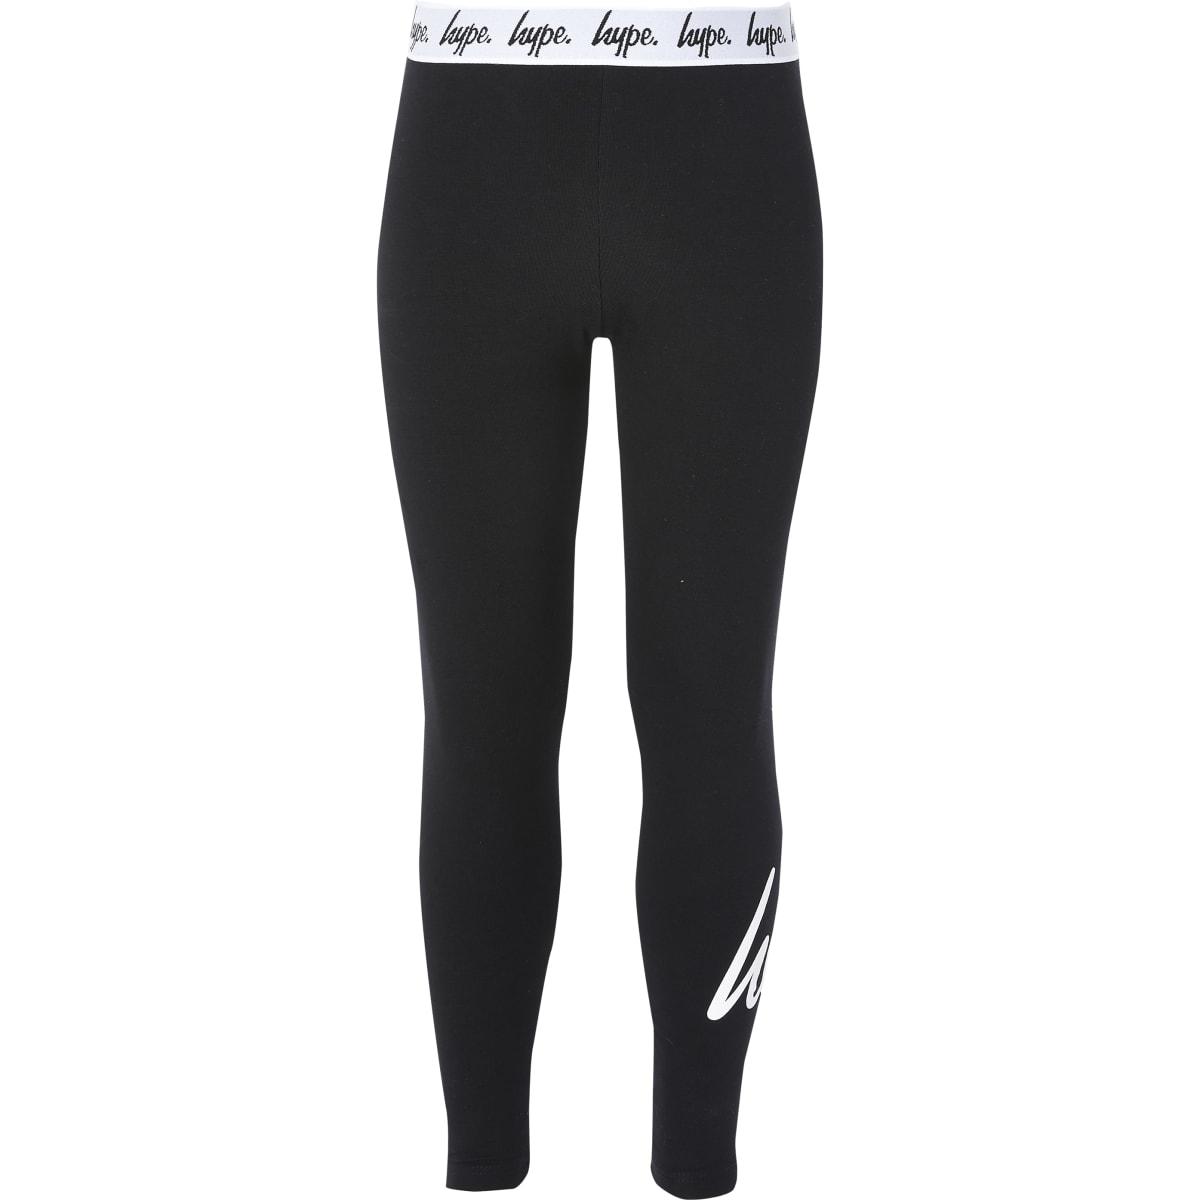 Girls Hype black printed leggings